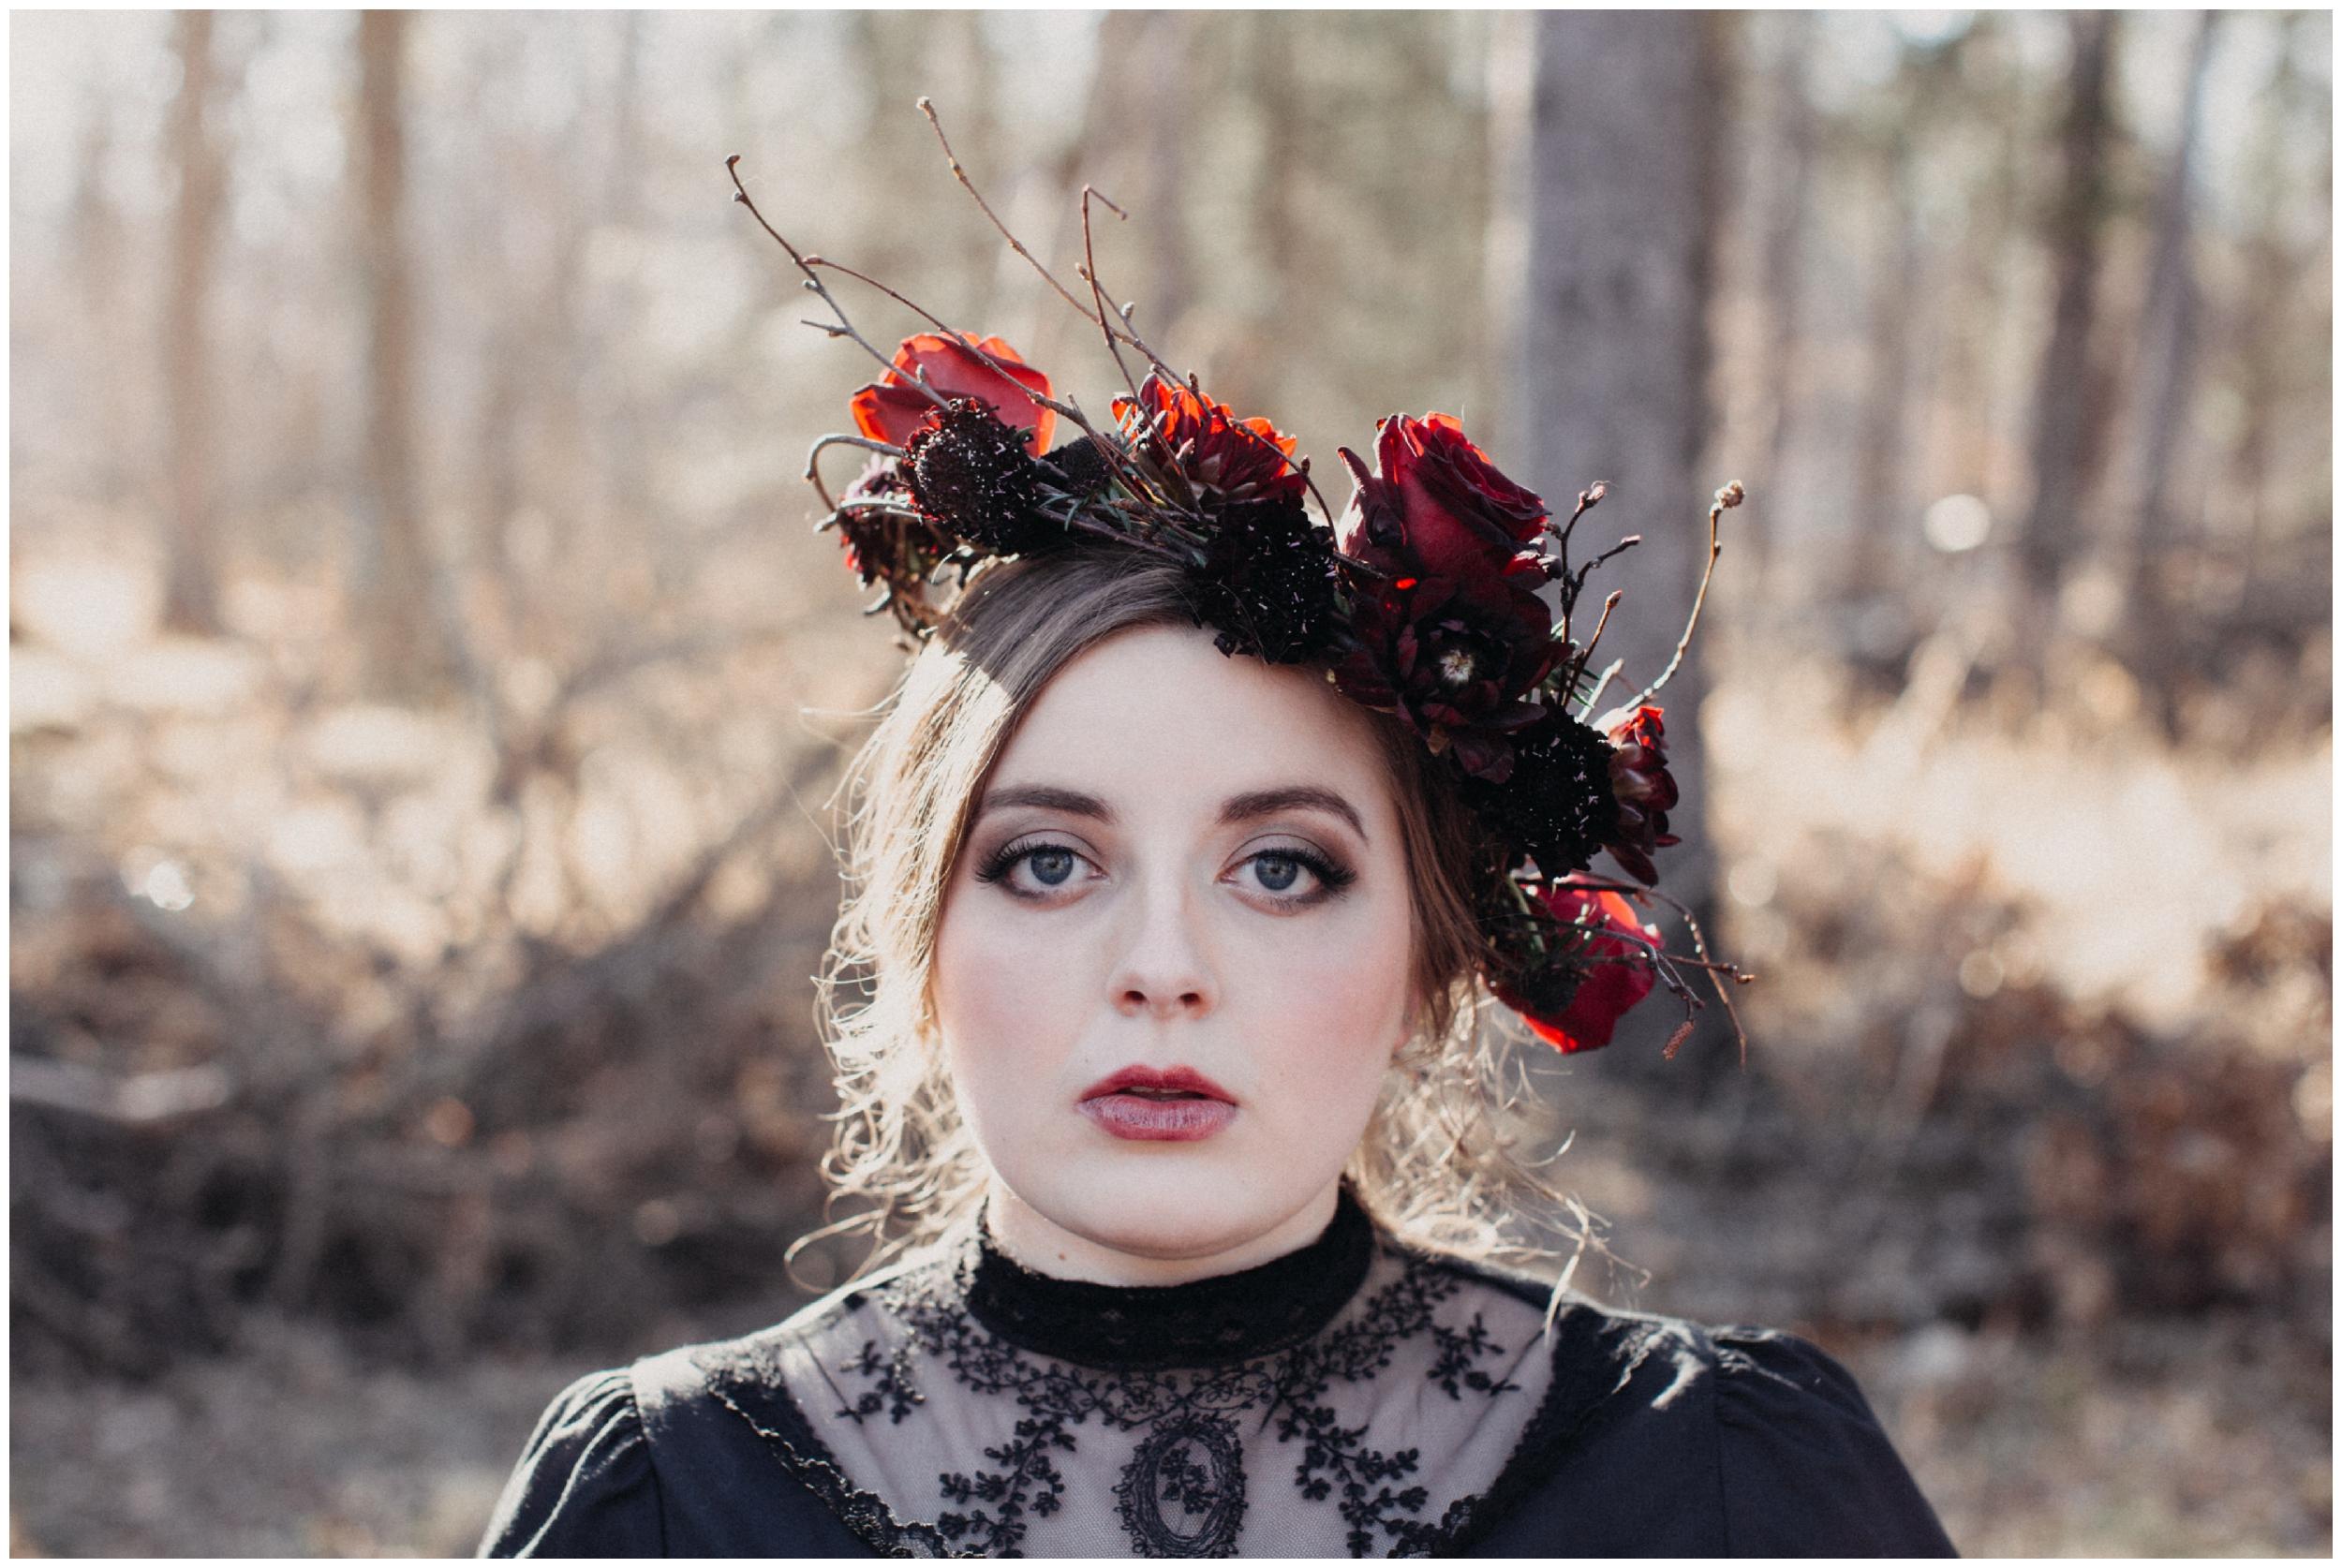 Dark and romantic bridal portrait session in the woods, by Minnesota photographer Britt DeZeeuw